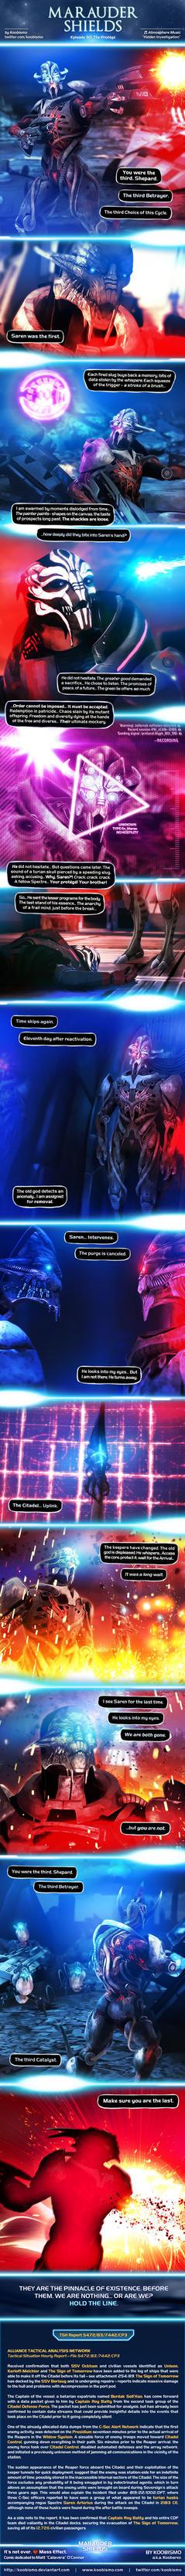 Marauder Shields 30: The Protege (Mass Effect) by koobismo